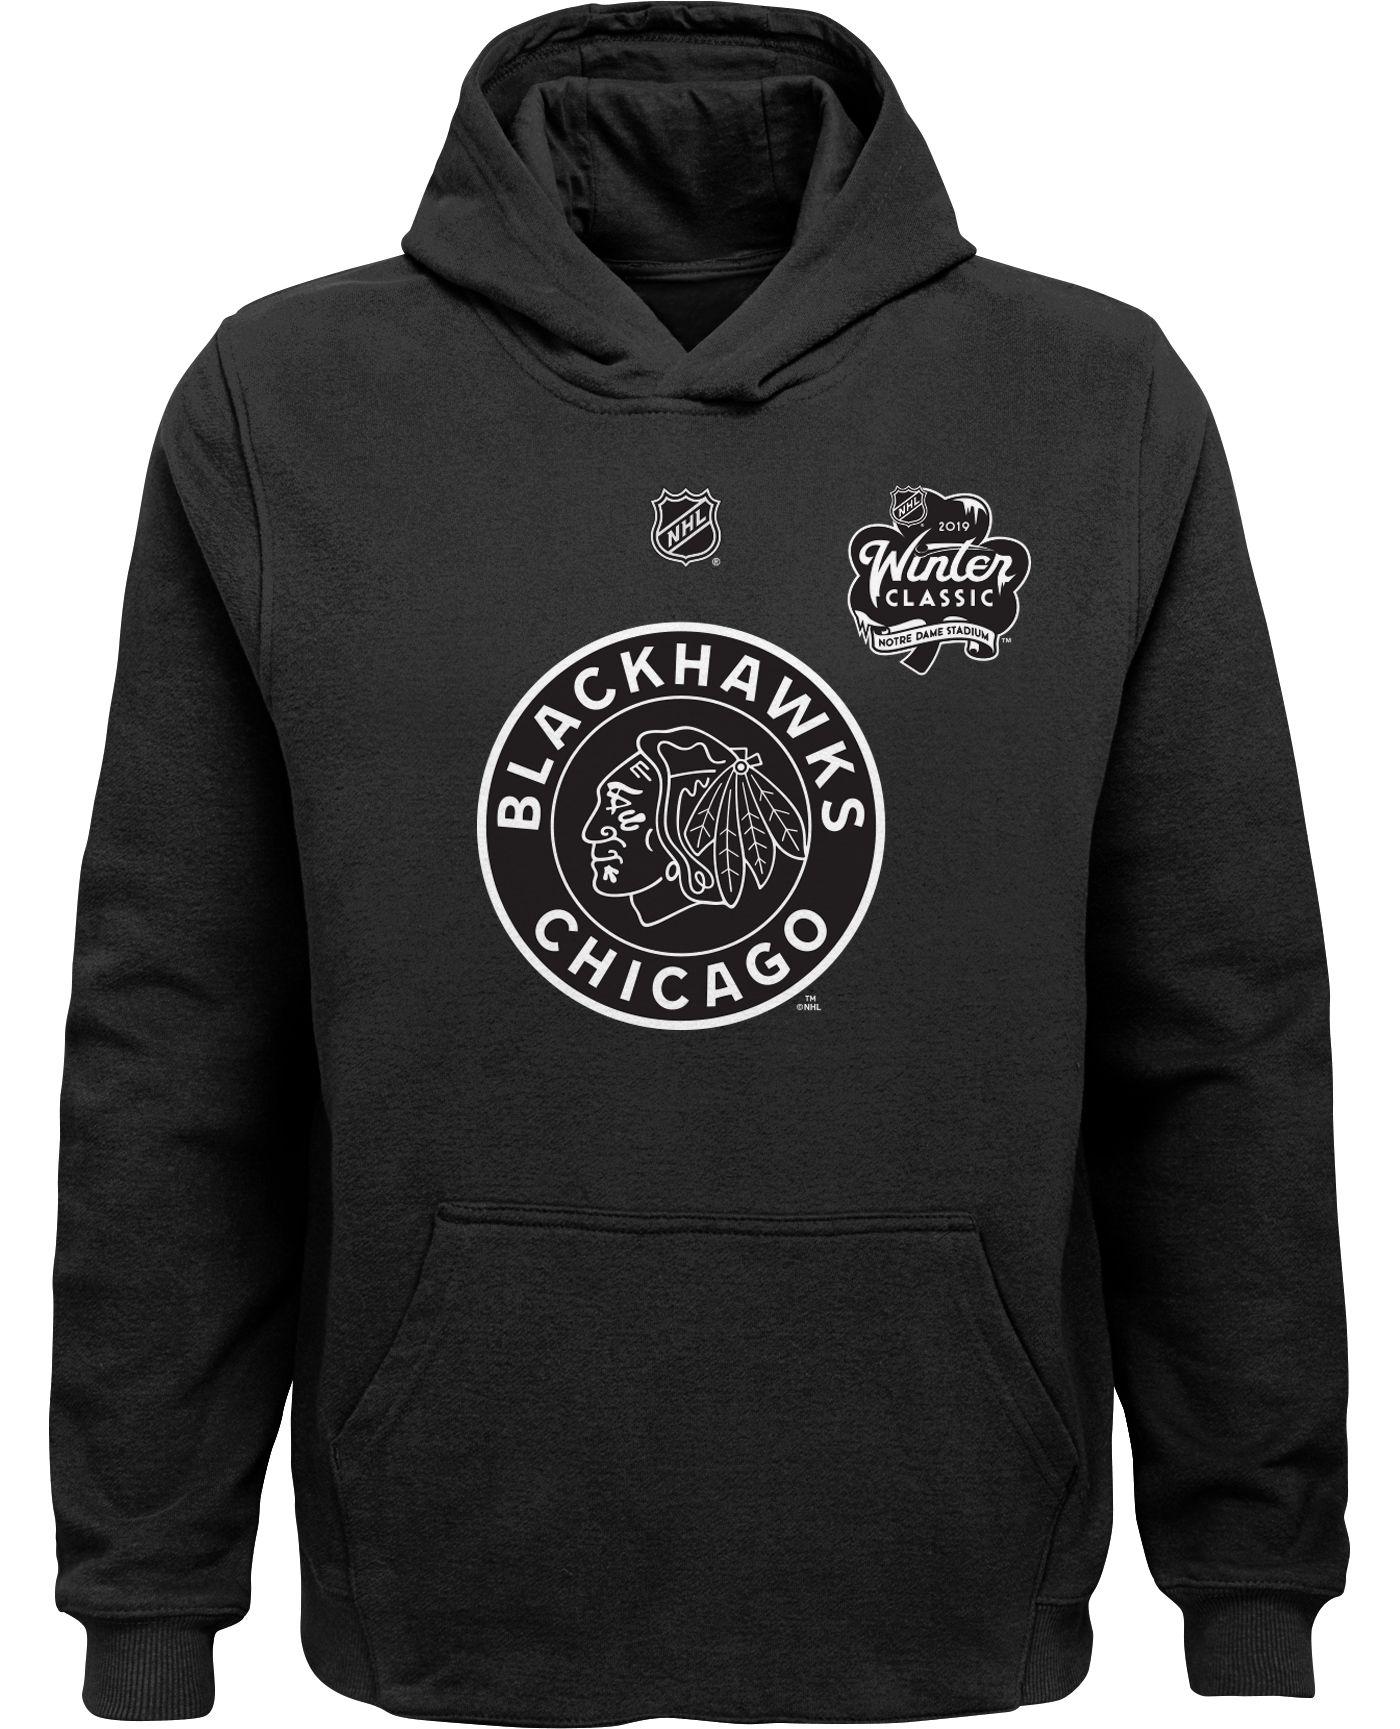 NHL Youth 2019 Winter Classic Chicago Blackhawks Logo Black Hoodie